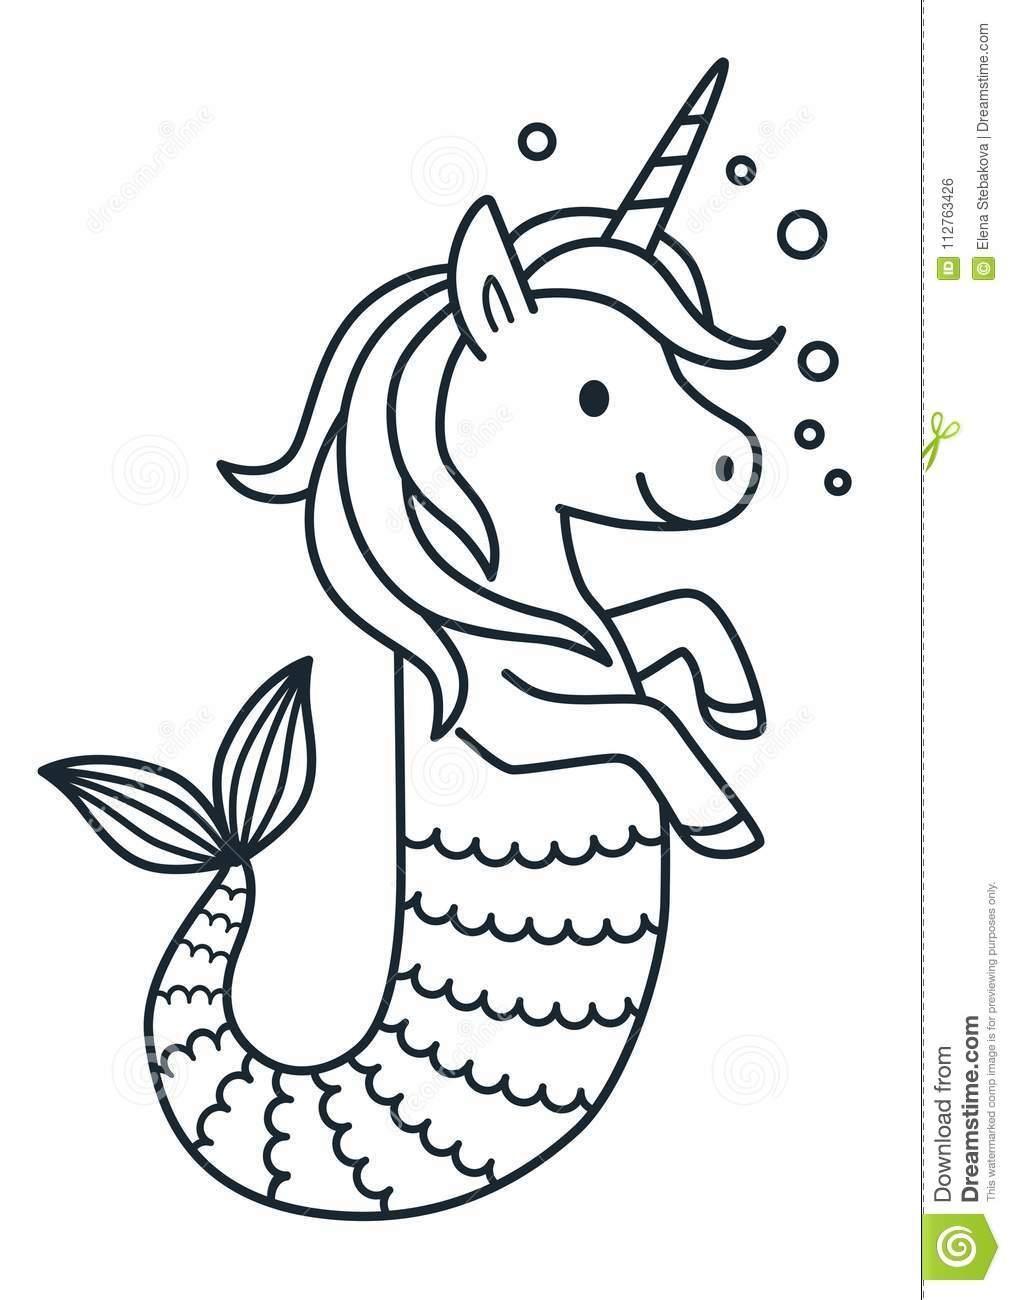 38 Coloring Page Mermaid Unicorn Mermaid Coloring Book Mermaid Coloring Pages Unicorn Coloring Pages